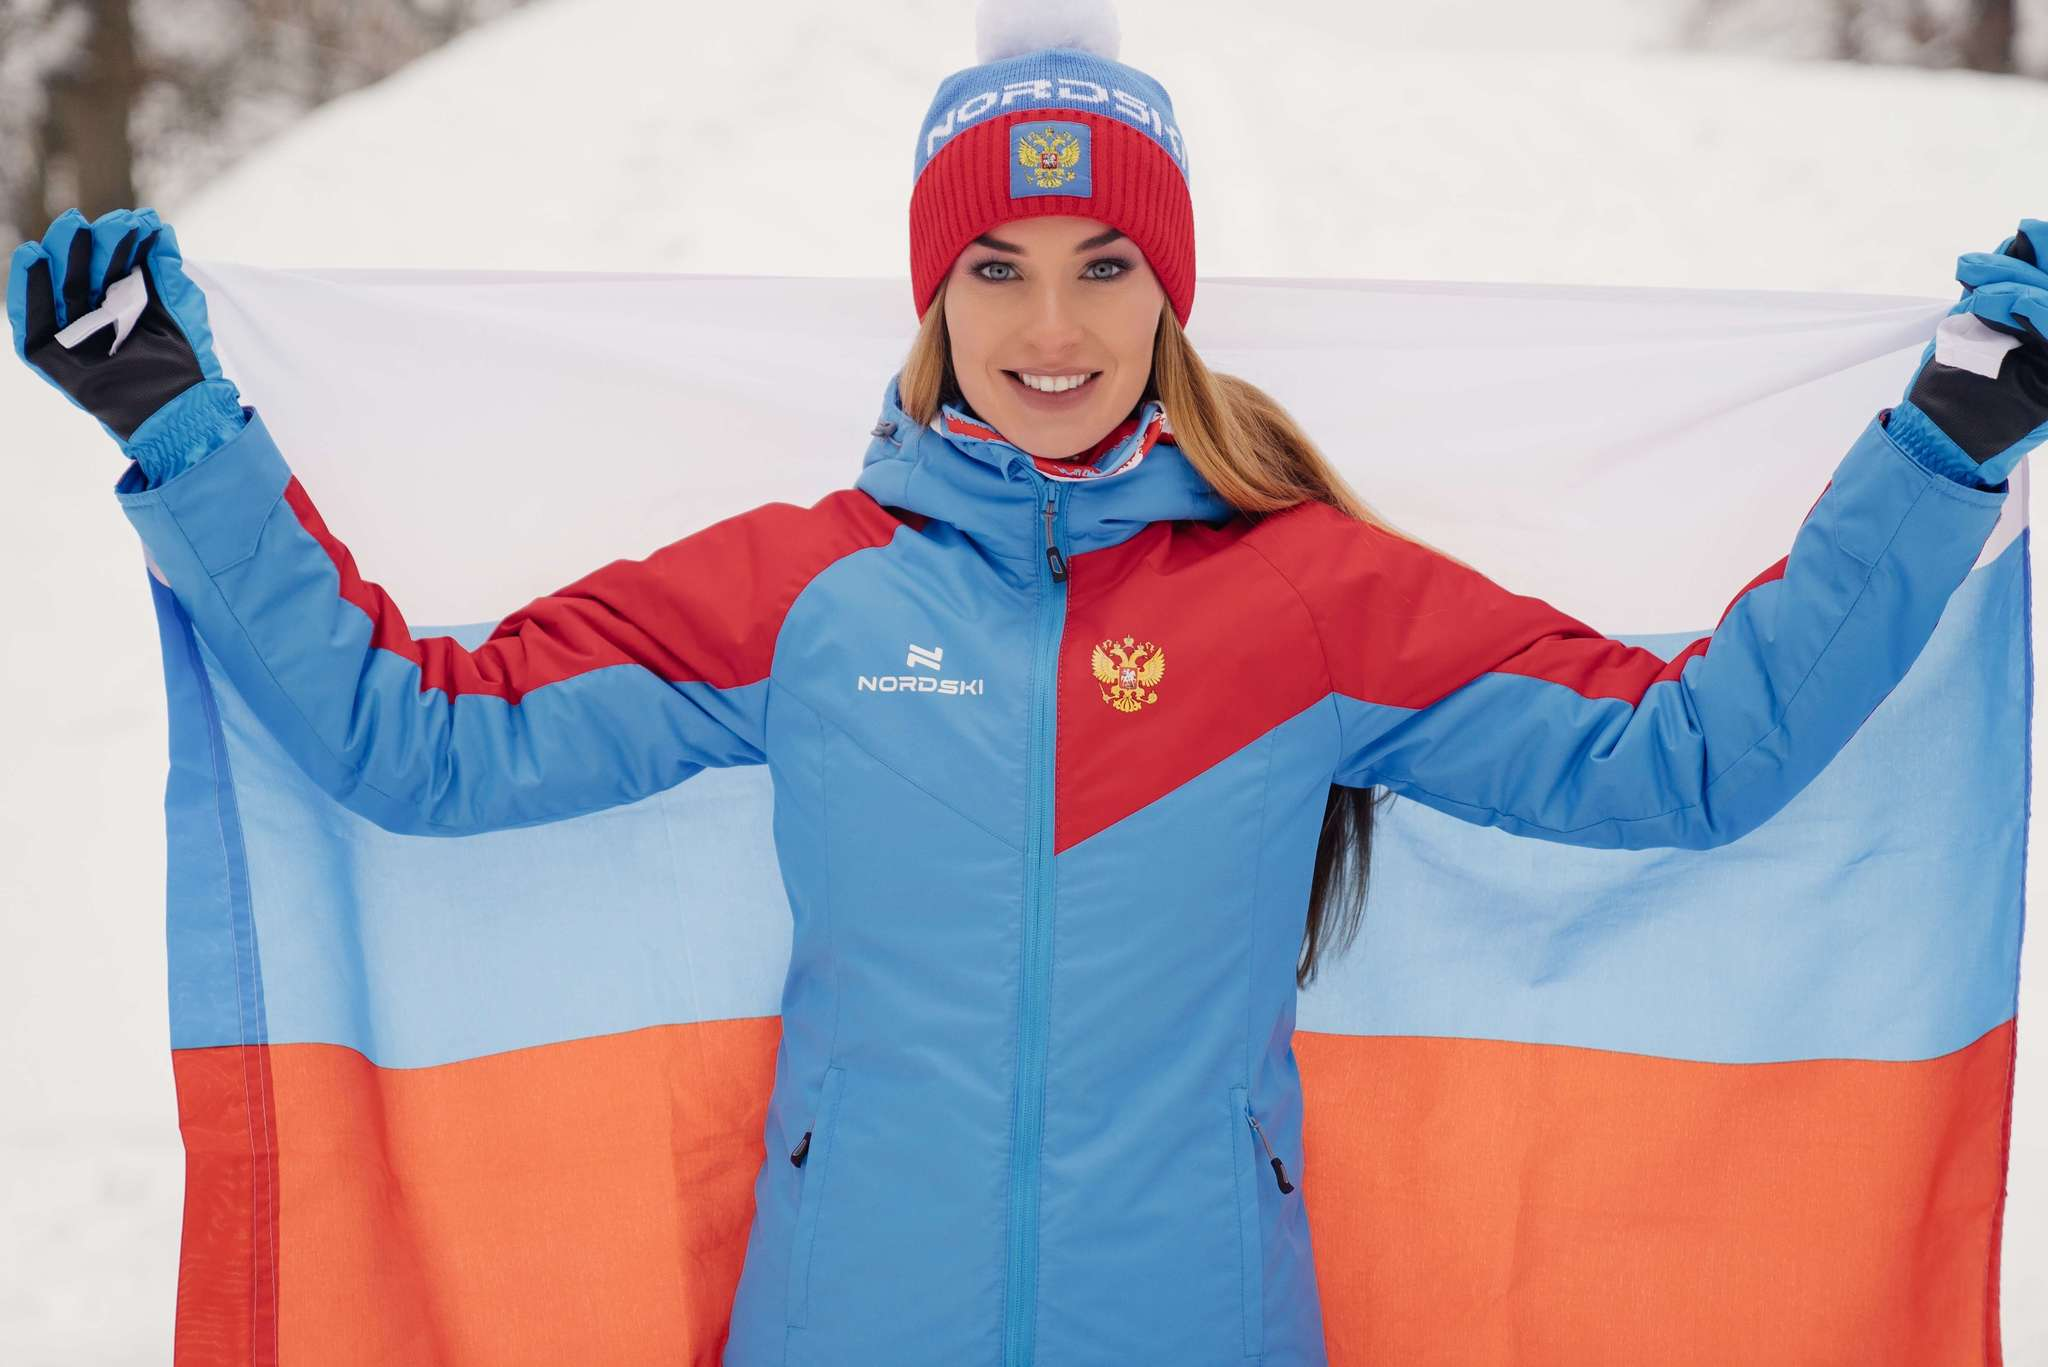 Nordski National 2.0 женская утепленная лыжная куртка - 7